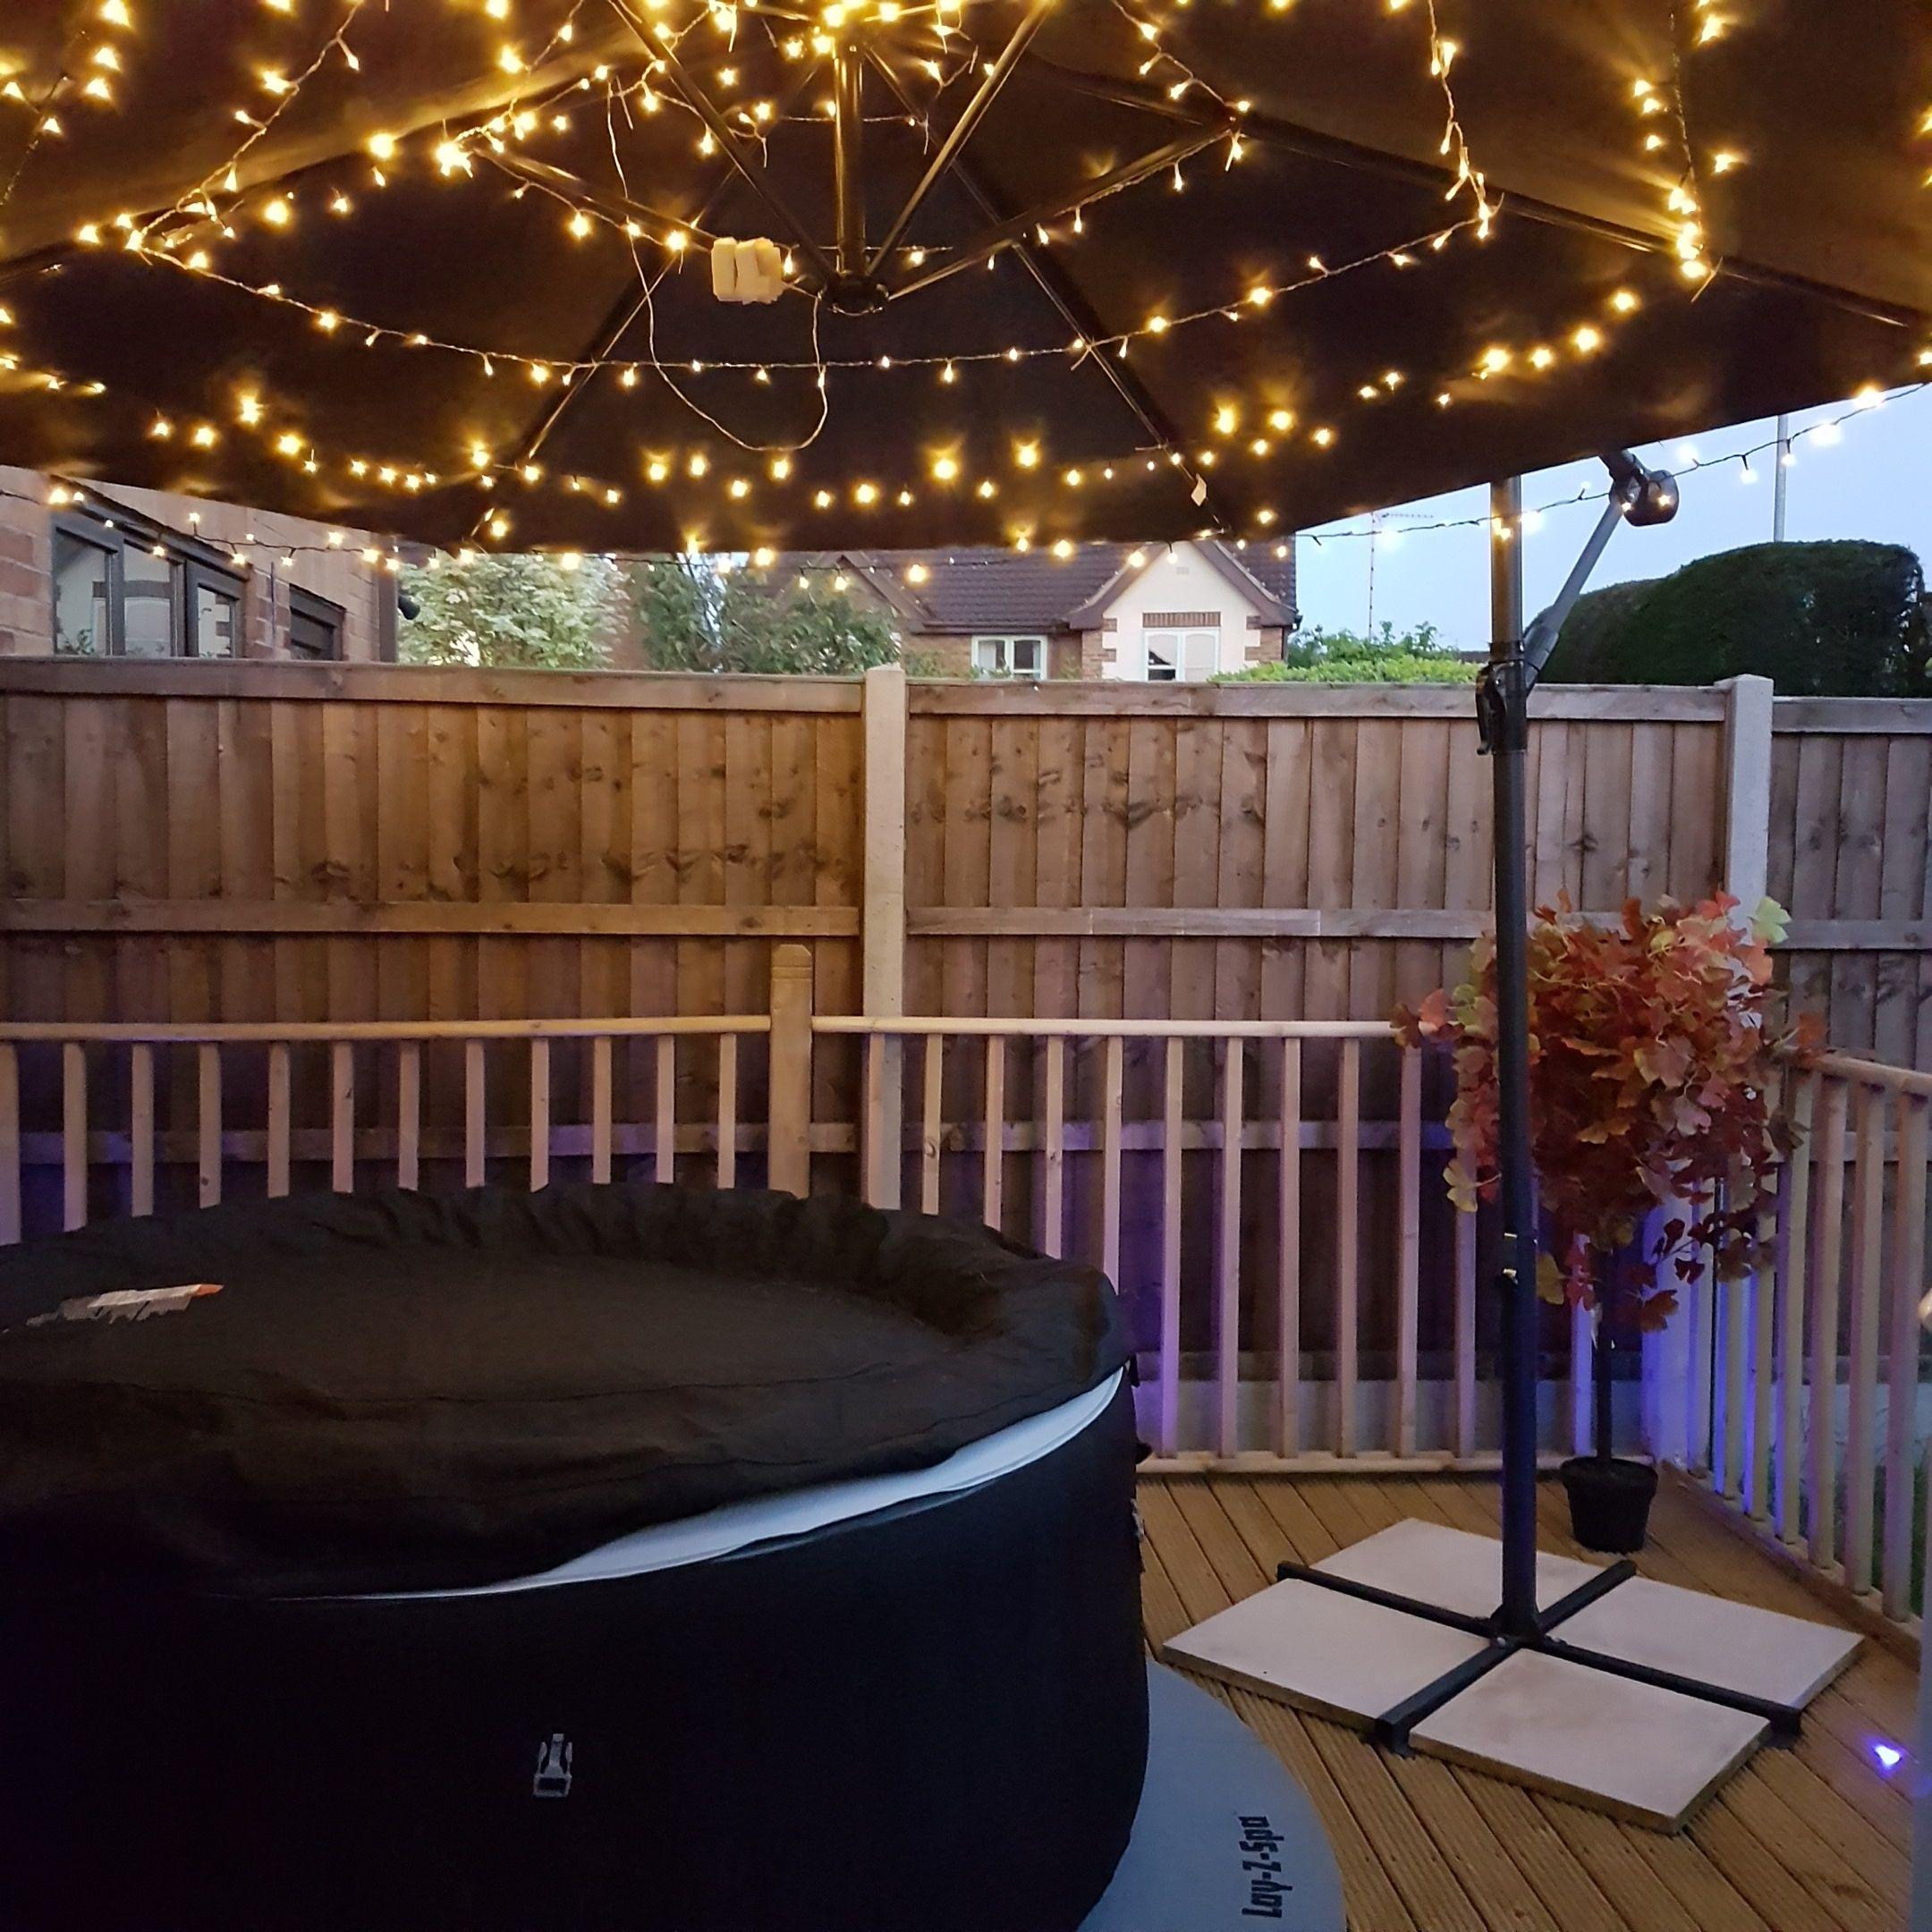 pin by gav gurd on garden lighting hot tub backyard hot. Black Bedroom Furniture Sets. Home Design Ideas